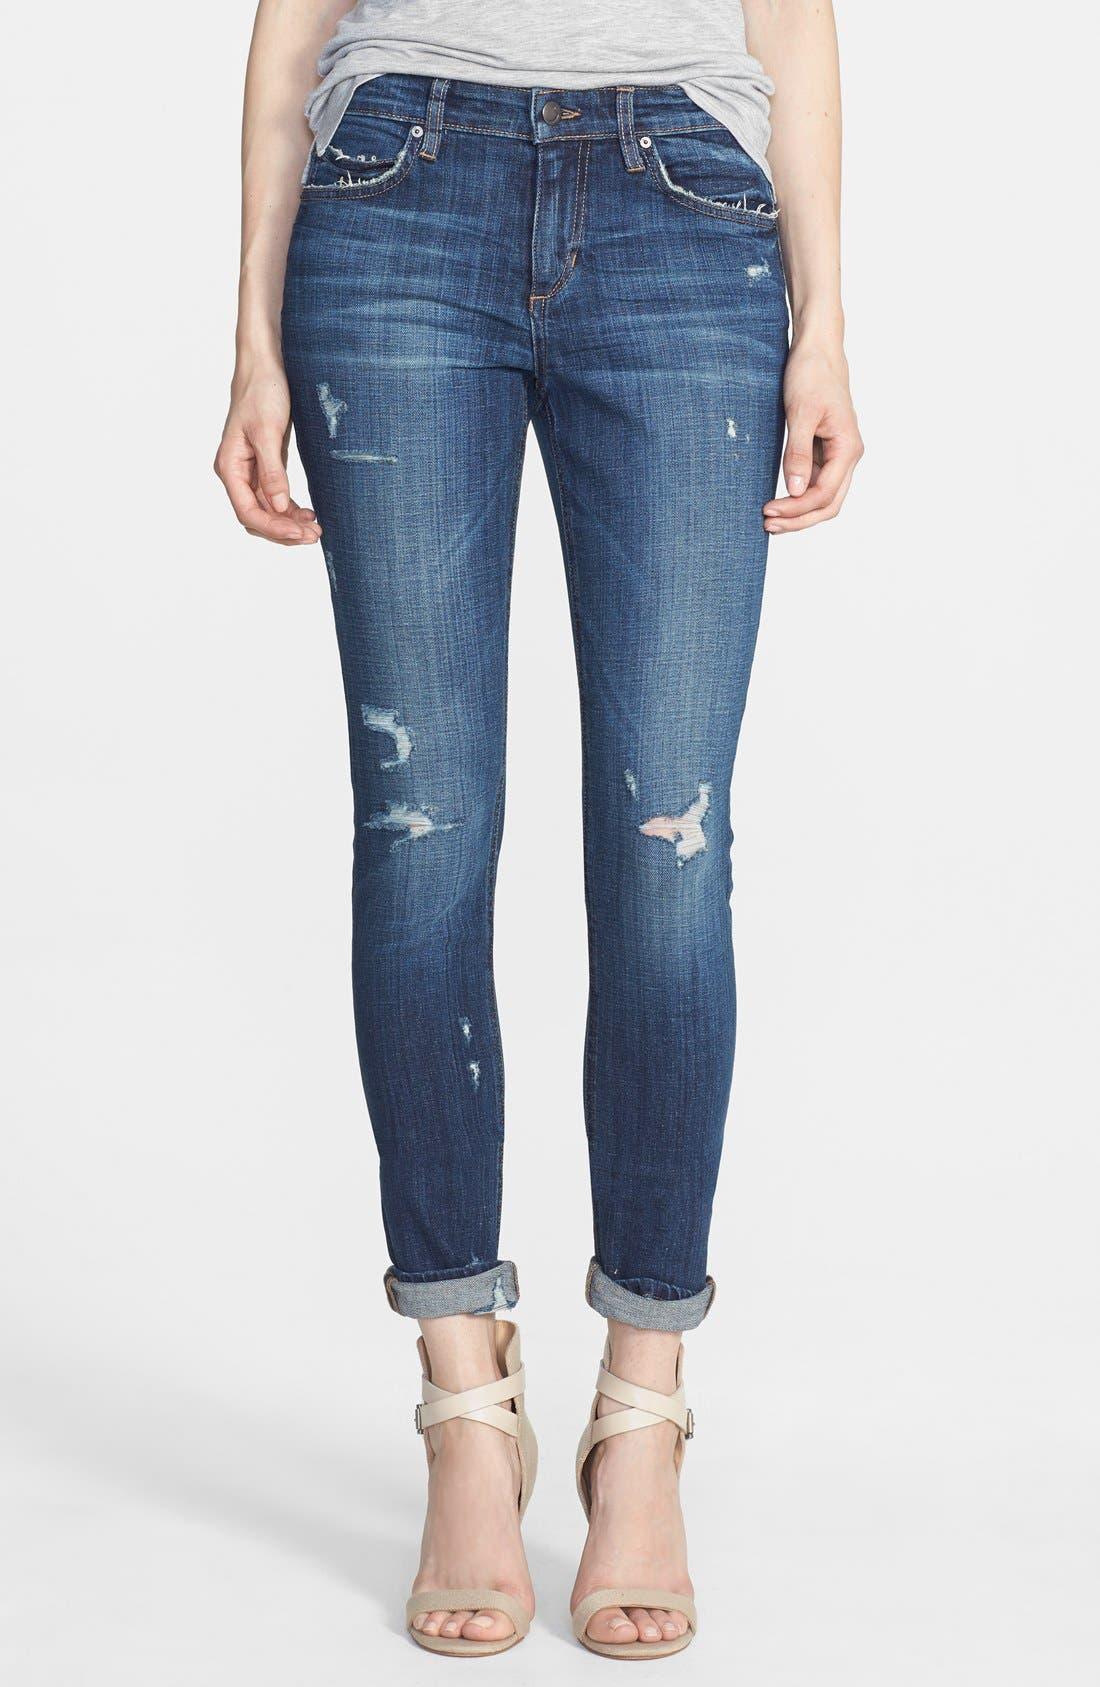 Alternate Image 1 Selected - Joe's Distressed Relaxed Slim Jeans (Riri)